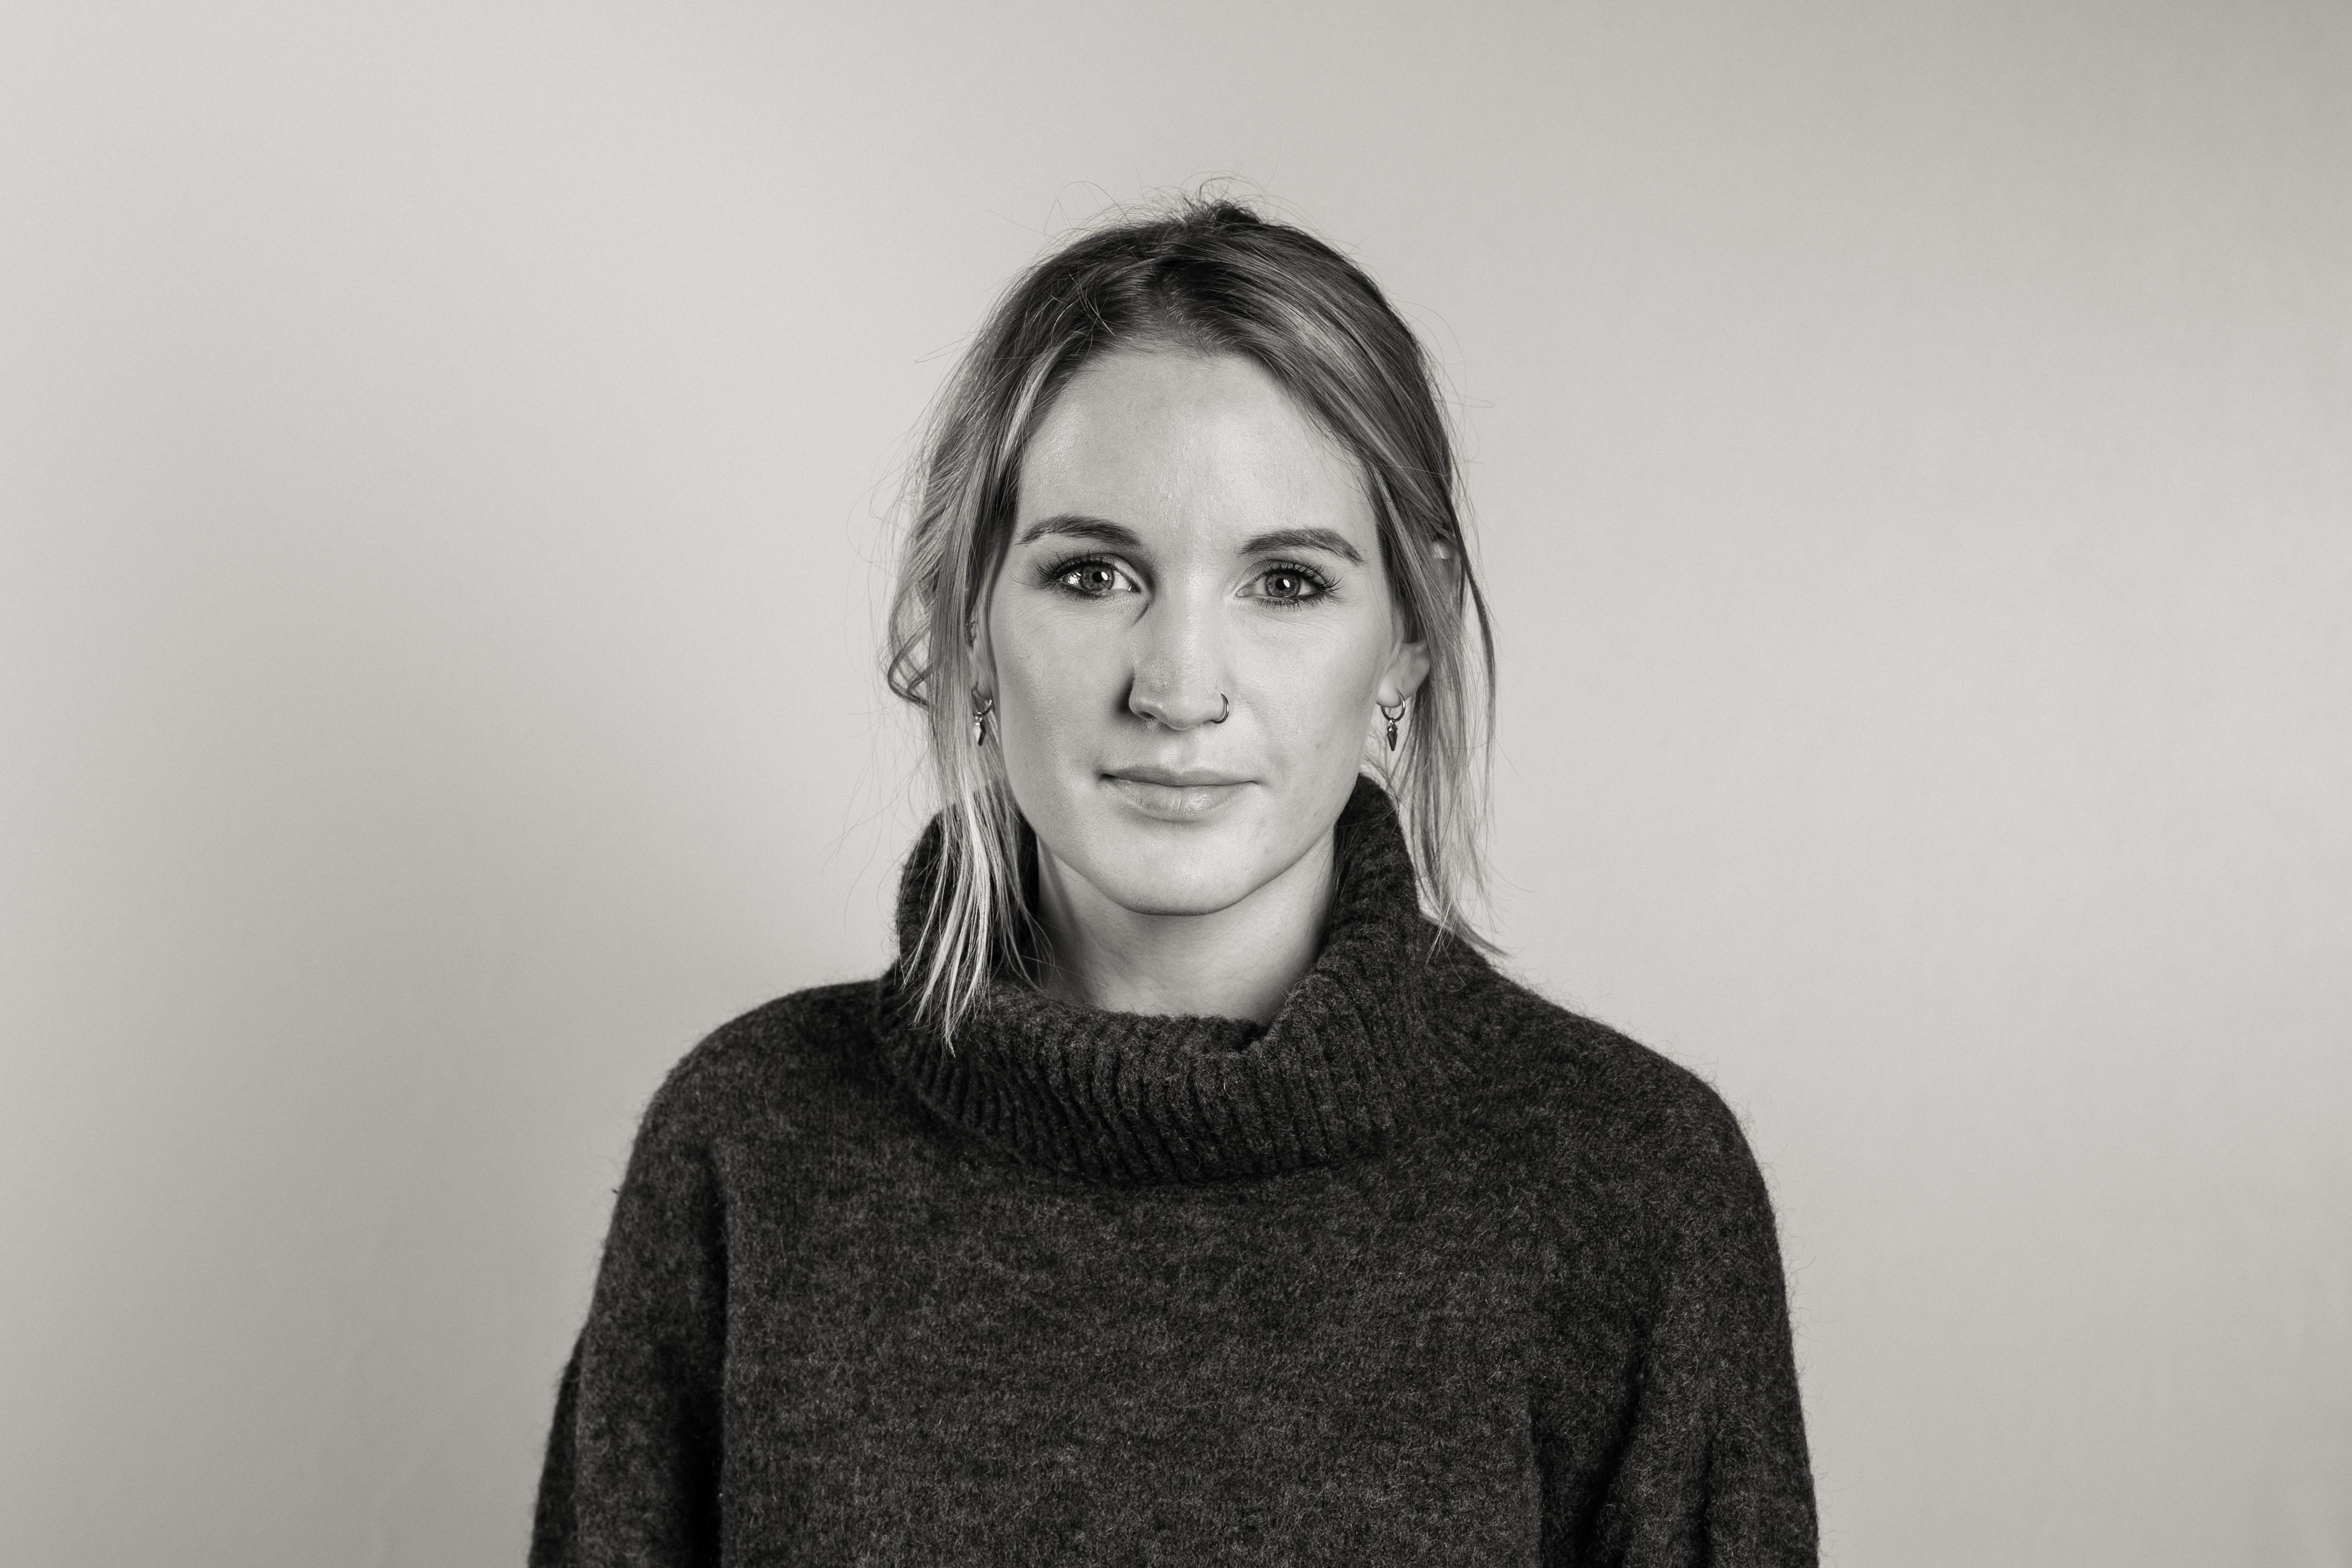 Jill Inkster